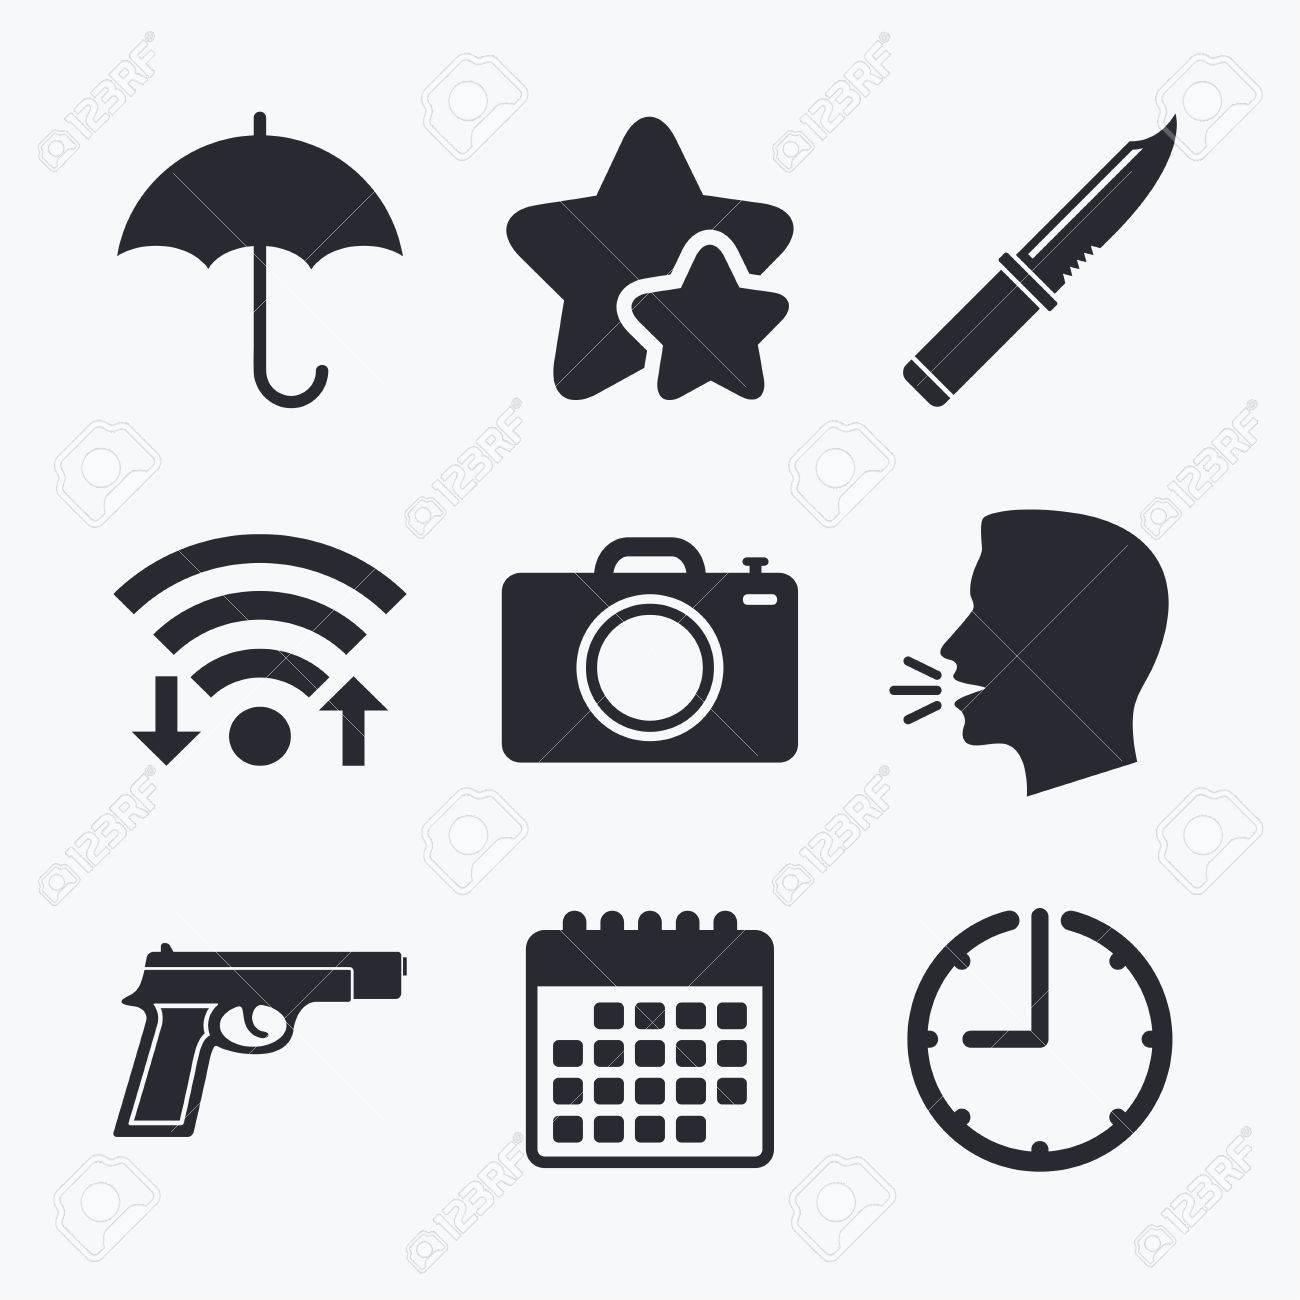 Pistol text symbol gallery symbol and sign ideas pistol text symbol choice image symbol and sign ideas gun weapon iconife umbrella and photo camera buycottarizona